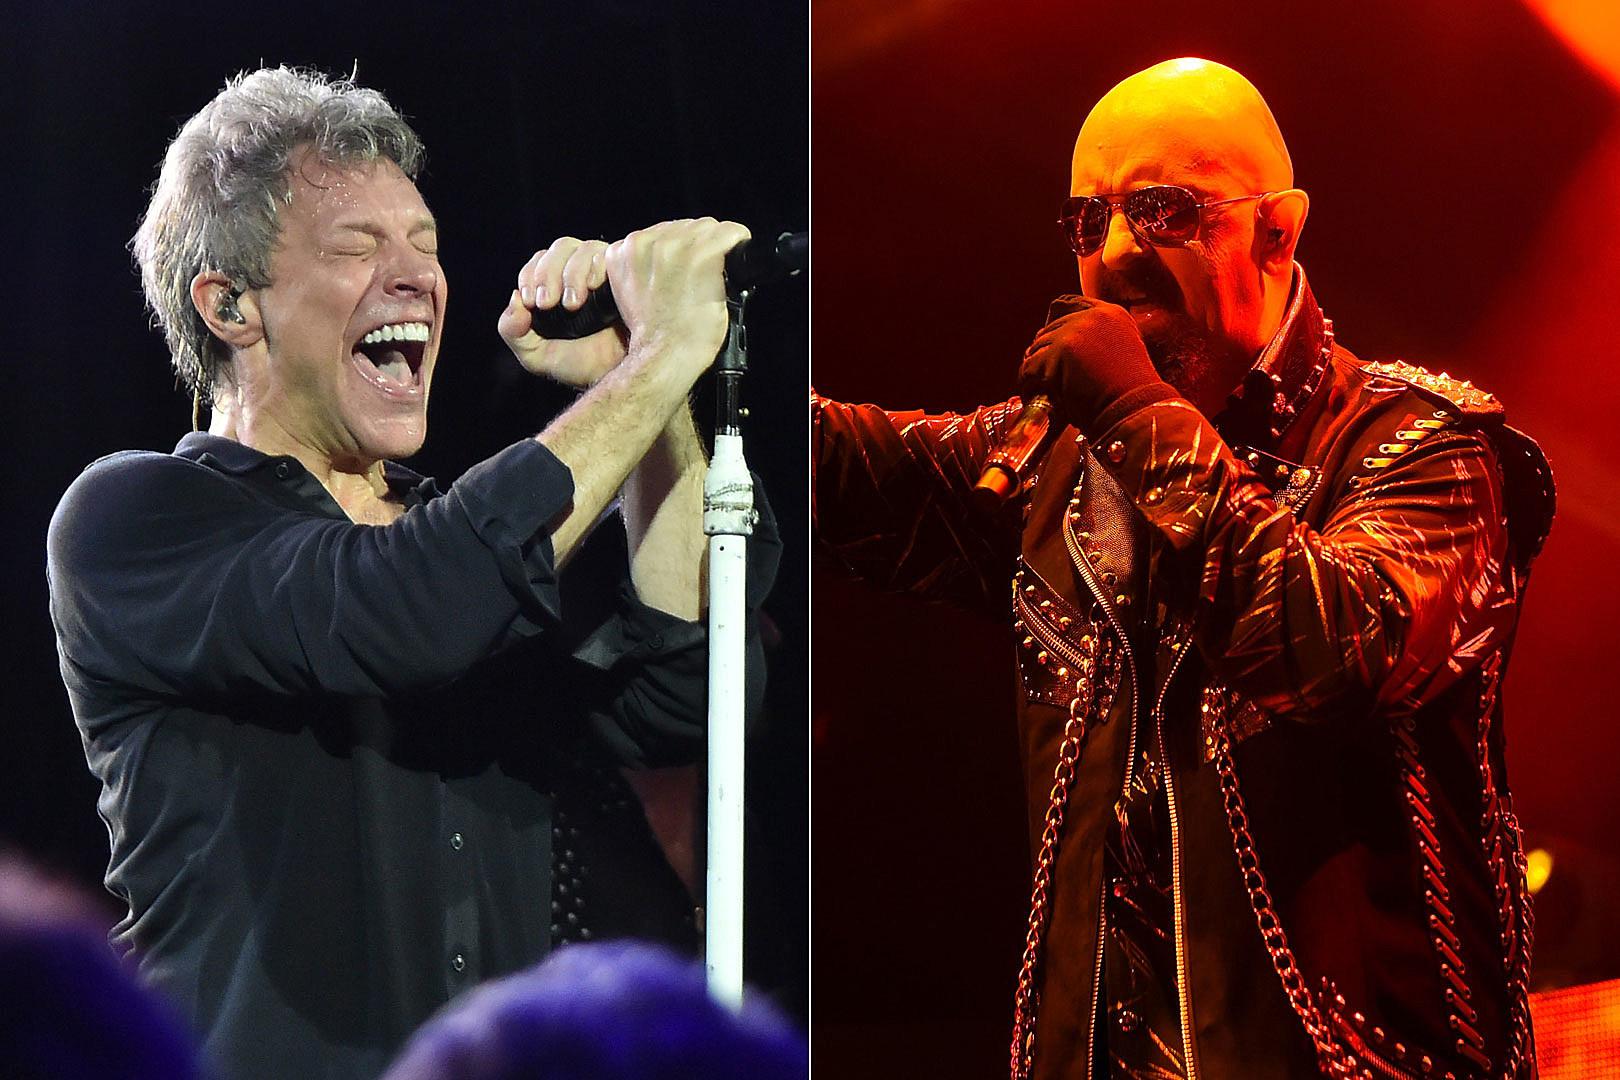 Watch: Jon Bon Jovi Becomes a Doctor of Music